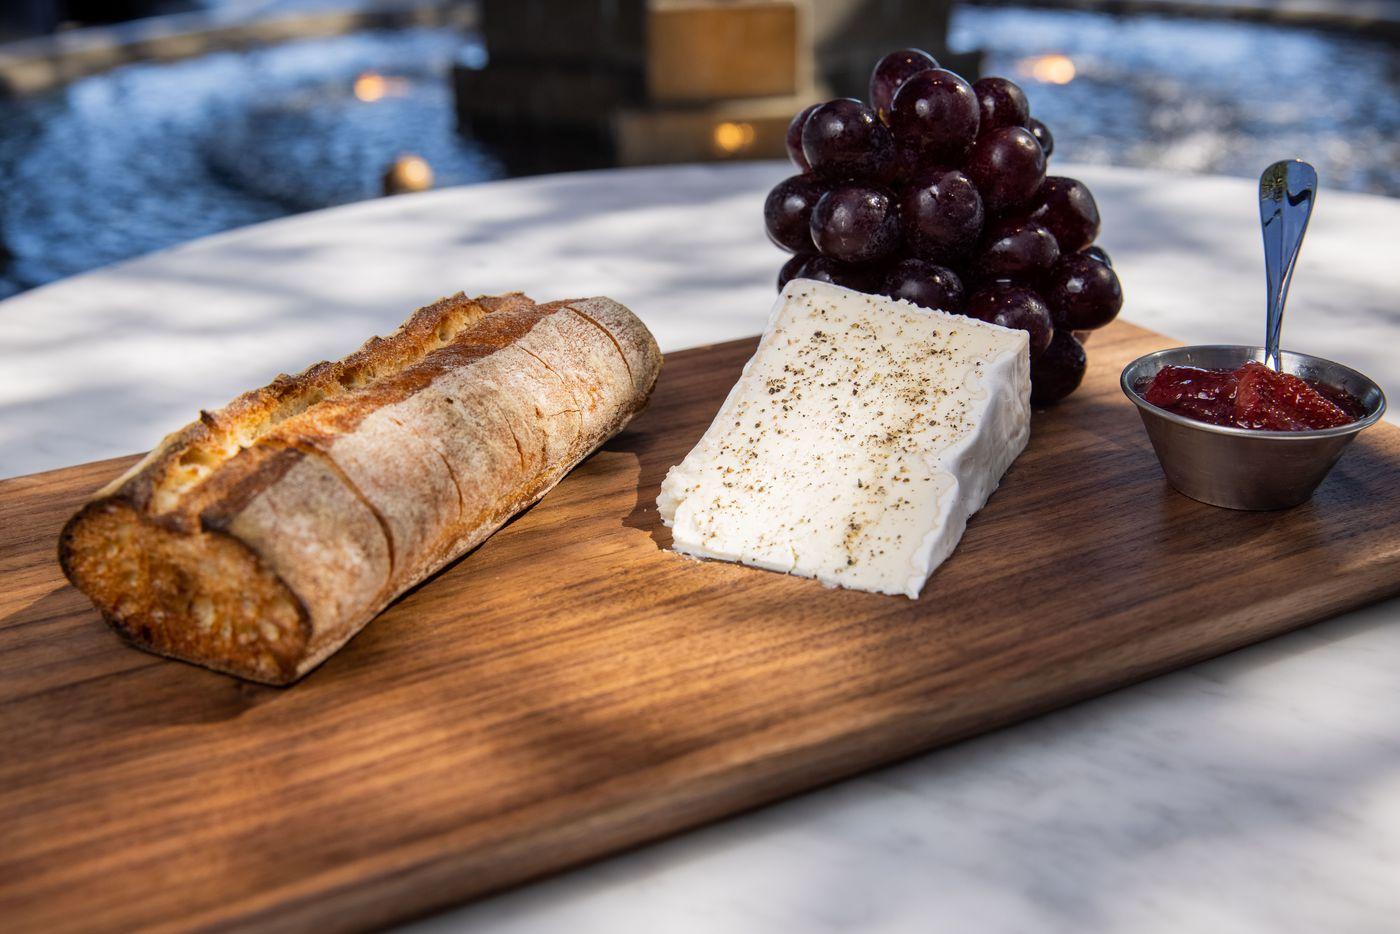 Délice de Bourgogne Cheese board